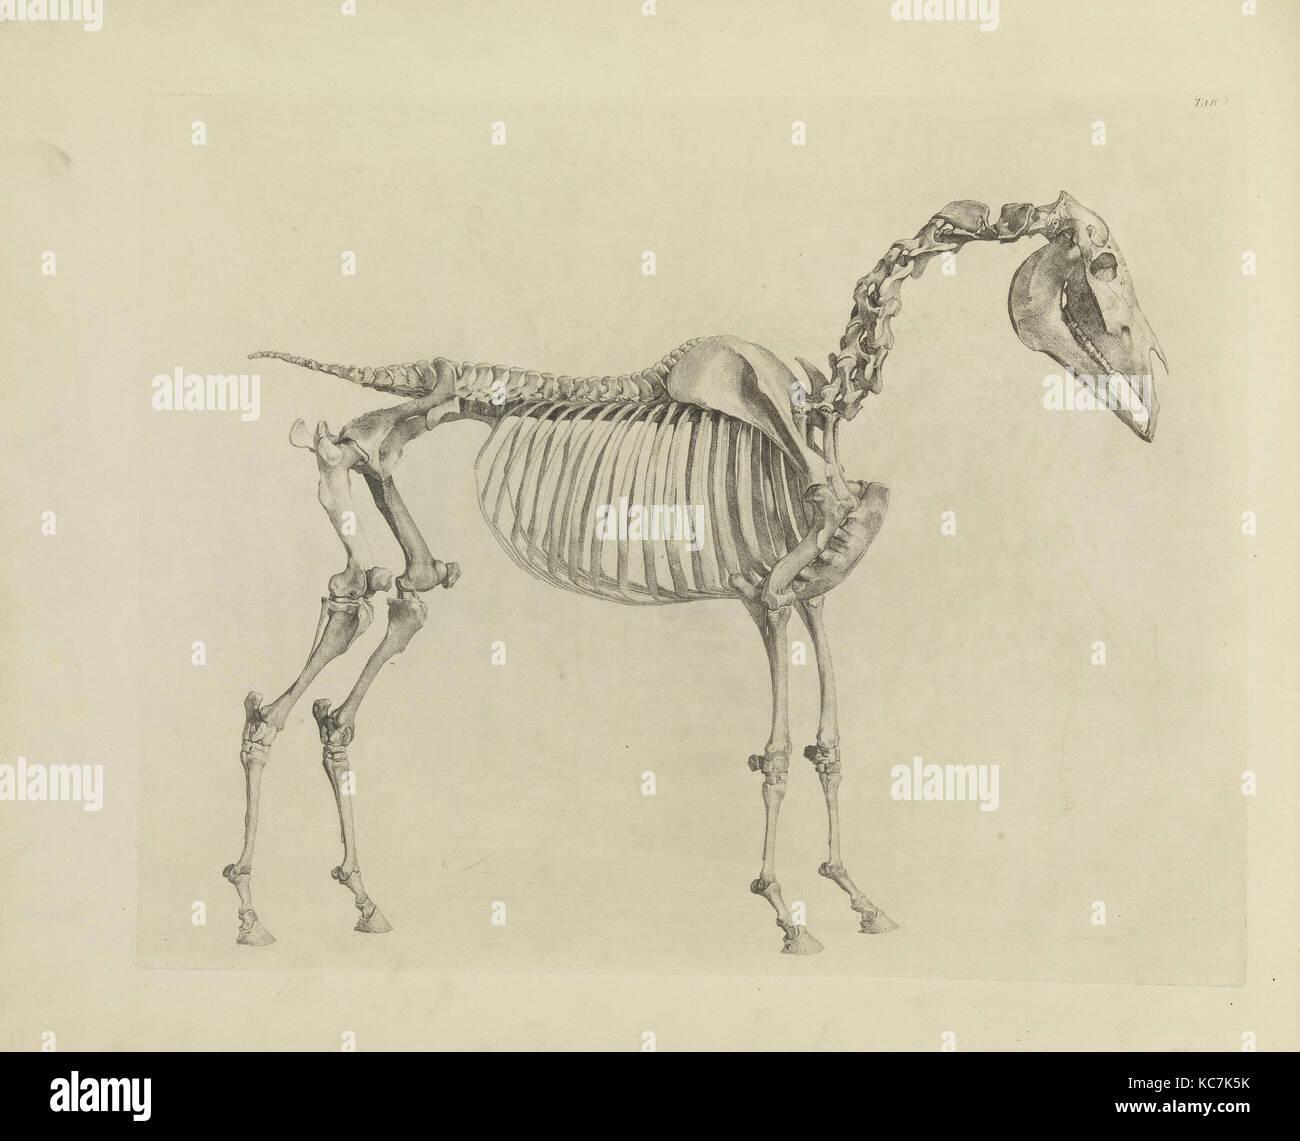 Cartilages Stockfotos & Cartilages Bilder - Alamy